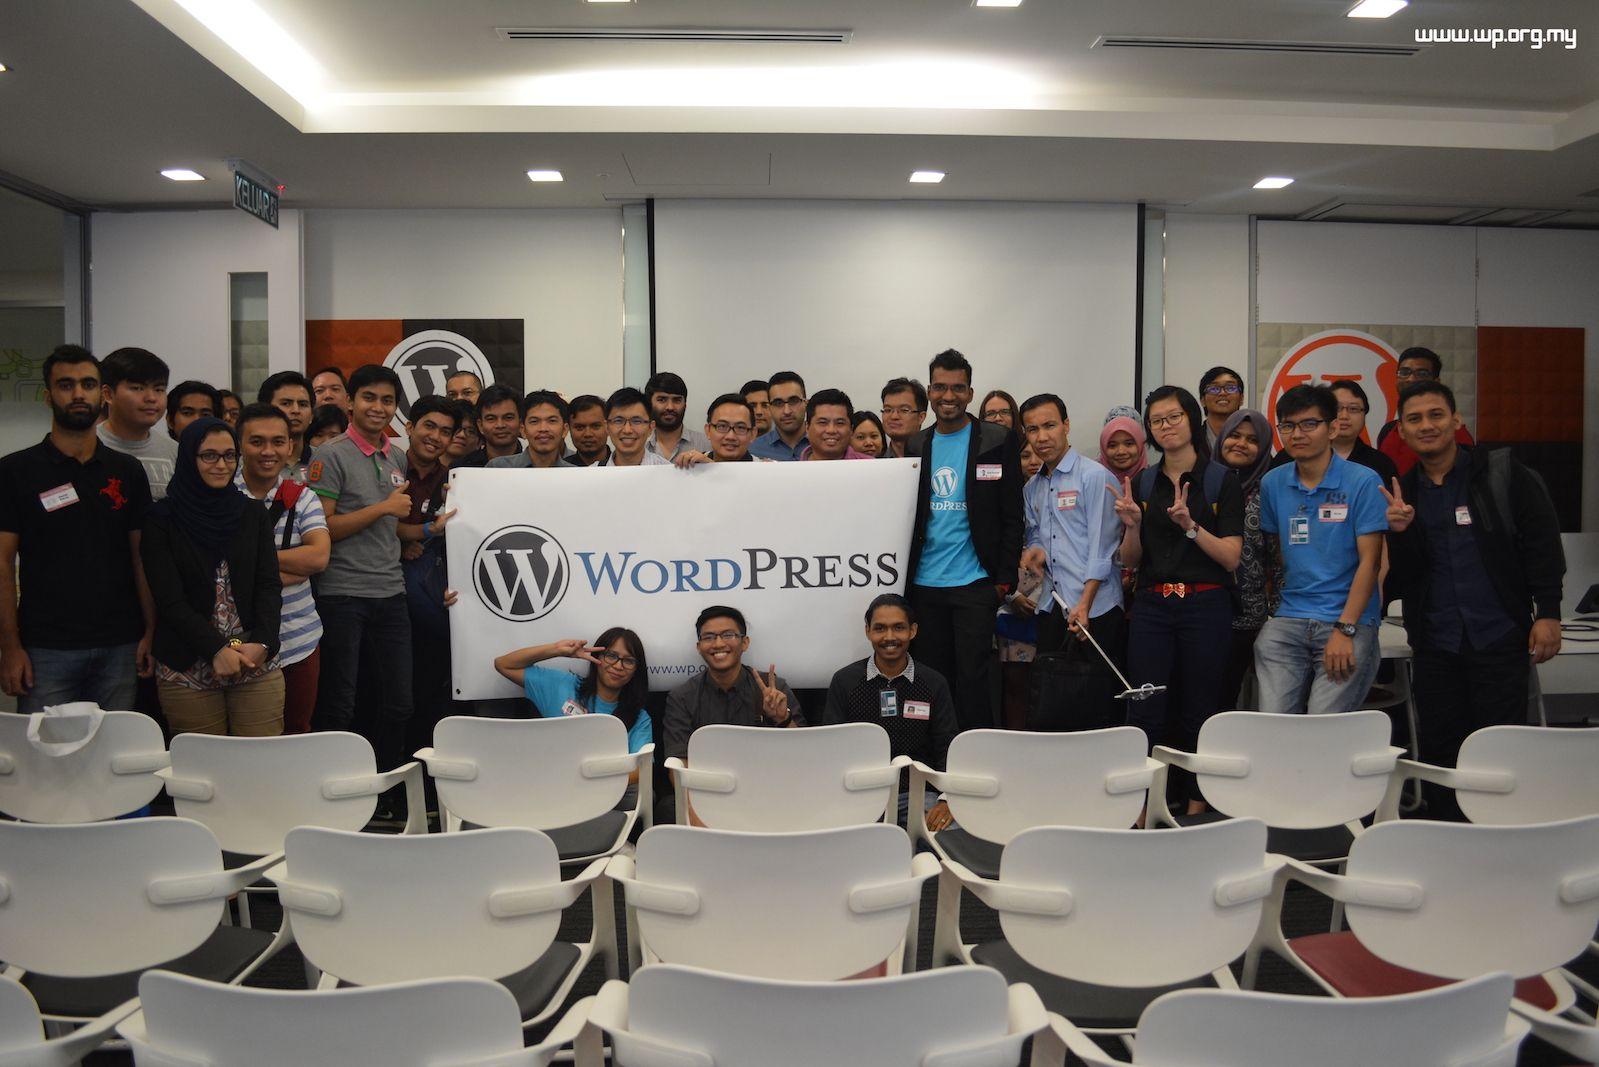 Kuala Lumpur WordPress Meetup